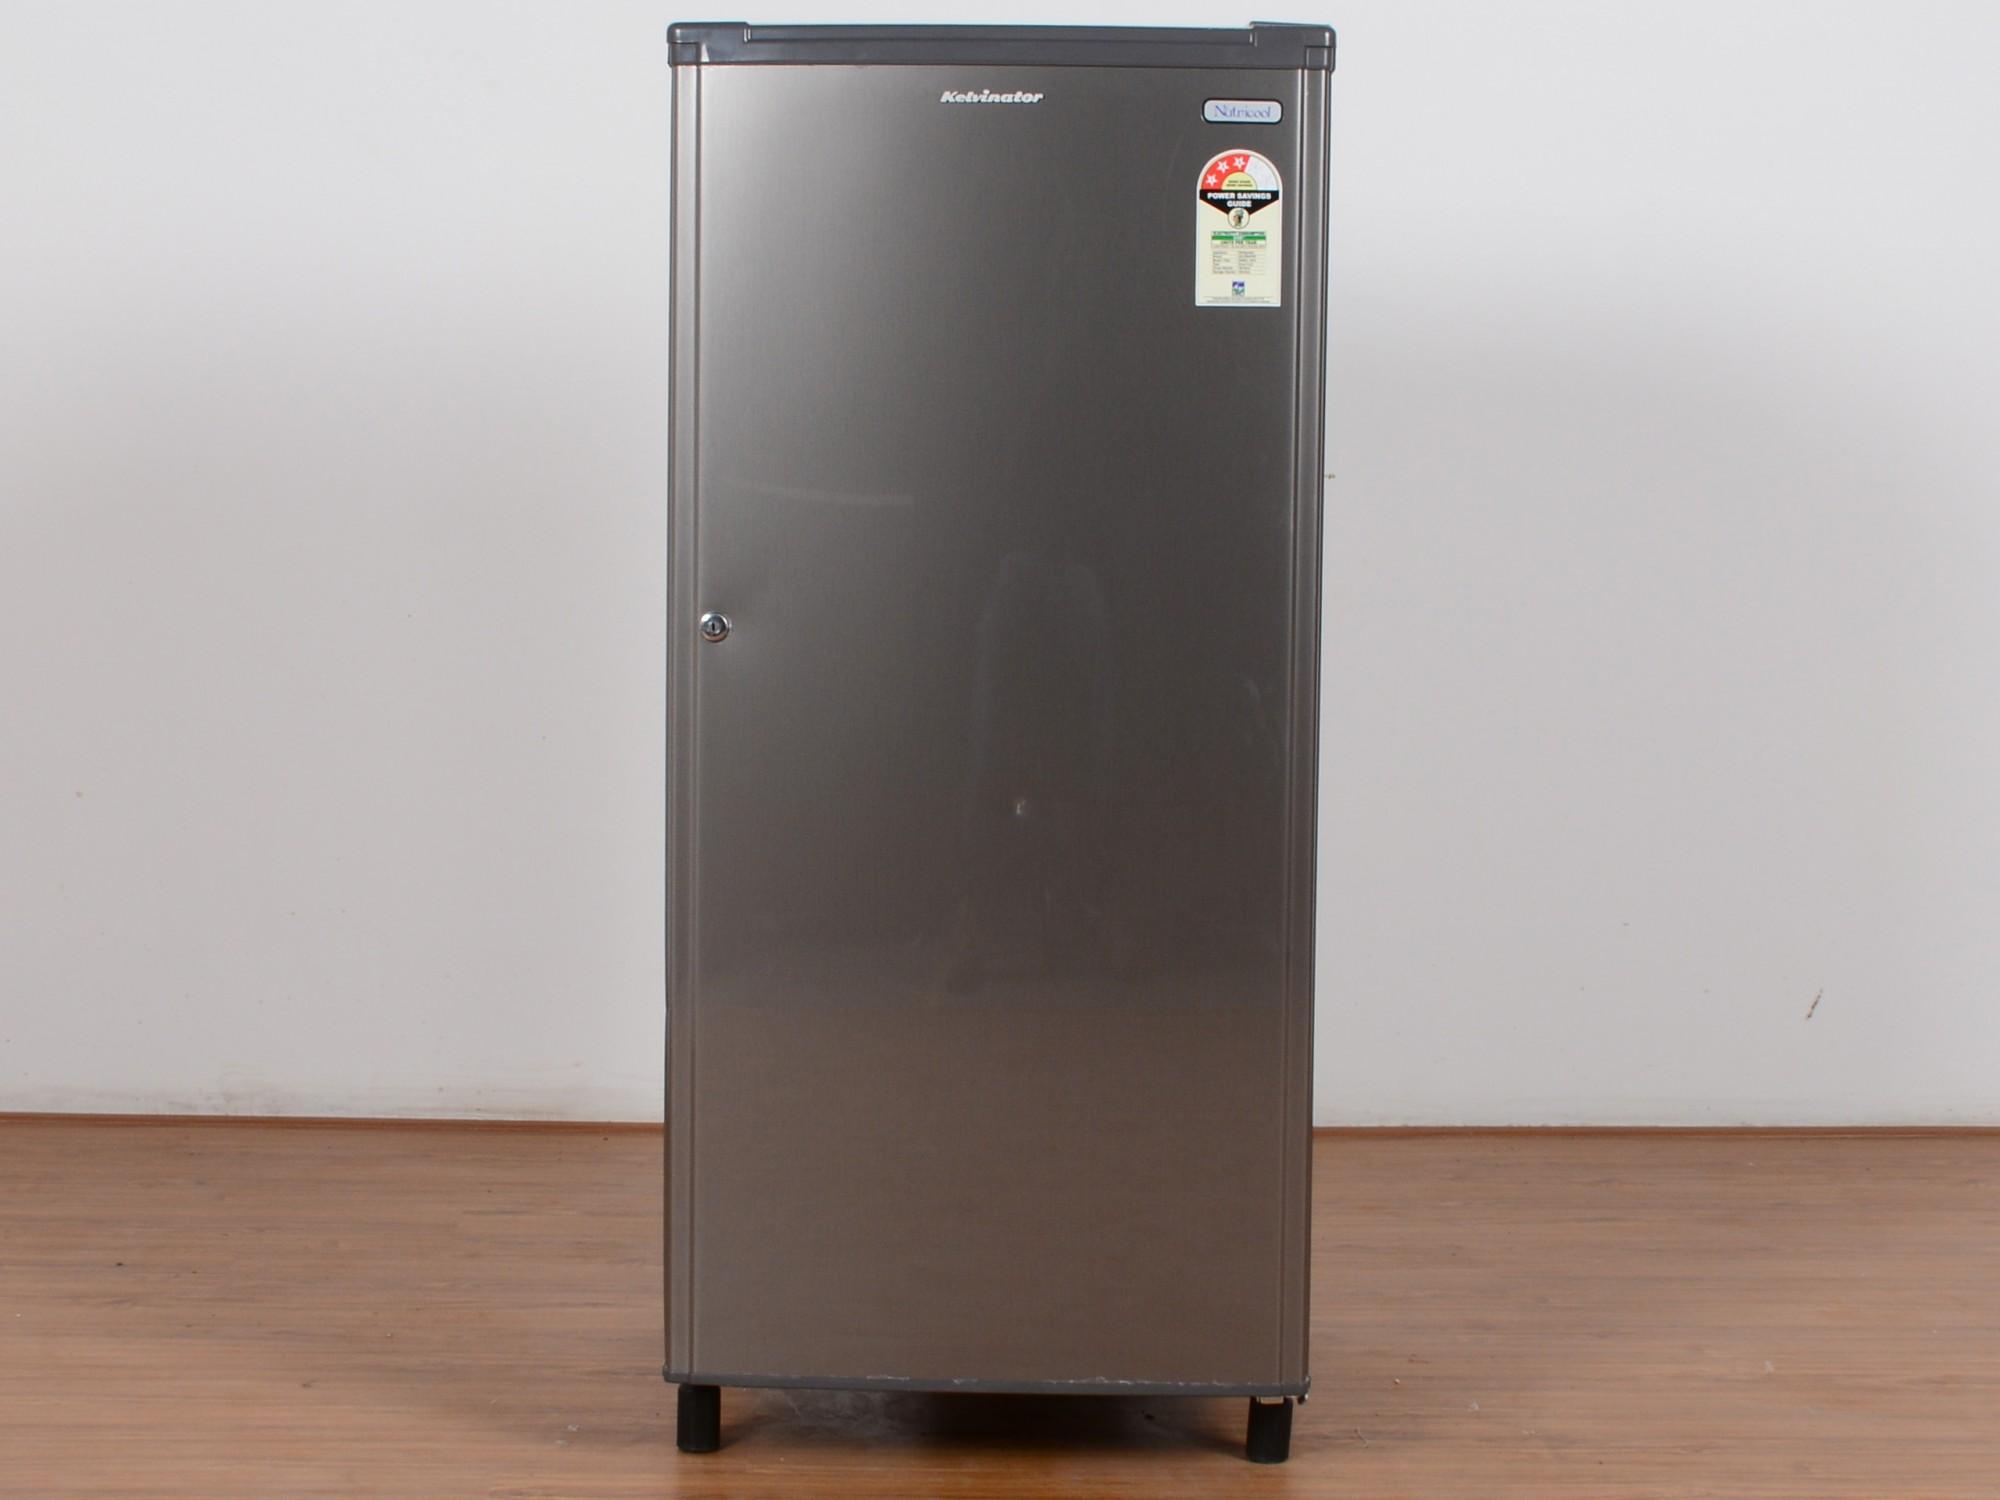 Kelvinator 190 L Direct Cool Single Door Refrigerator Kw203efyrh Fda Image